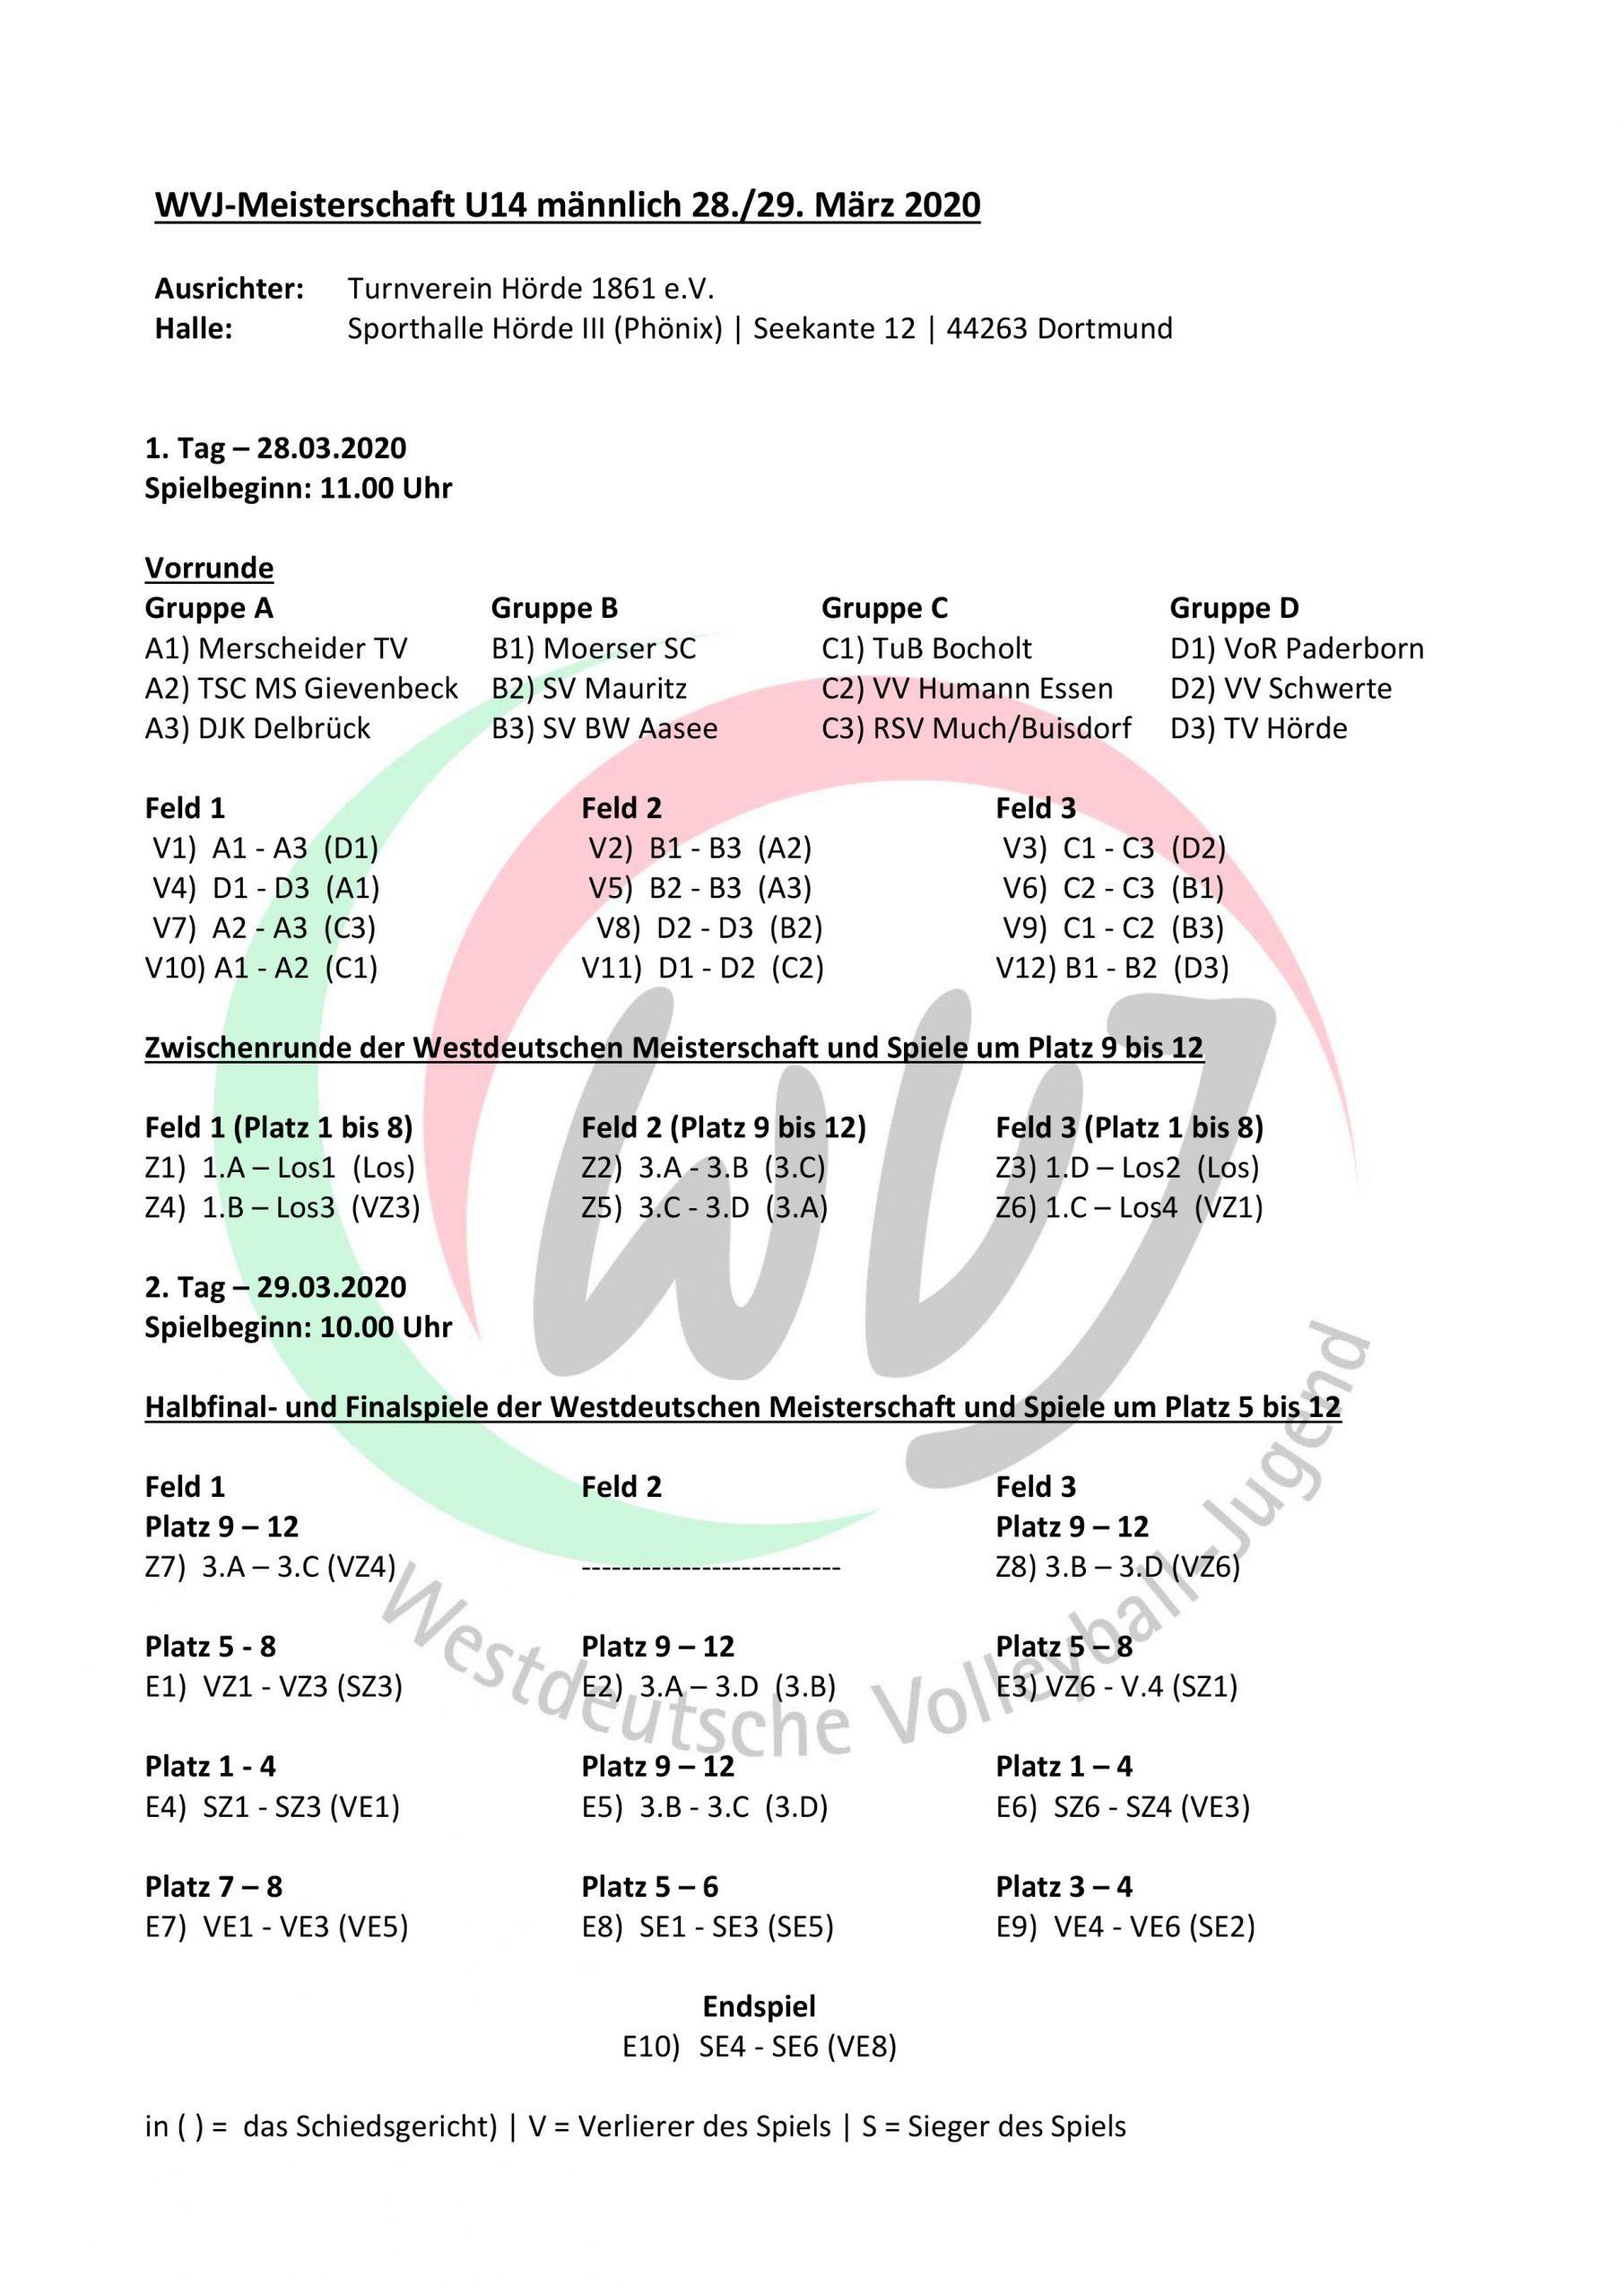 WDM U14 Spielplan 2020